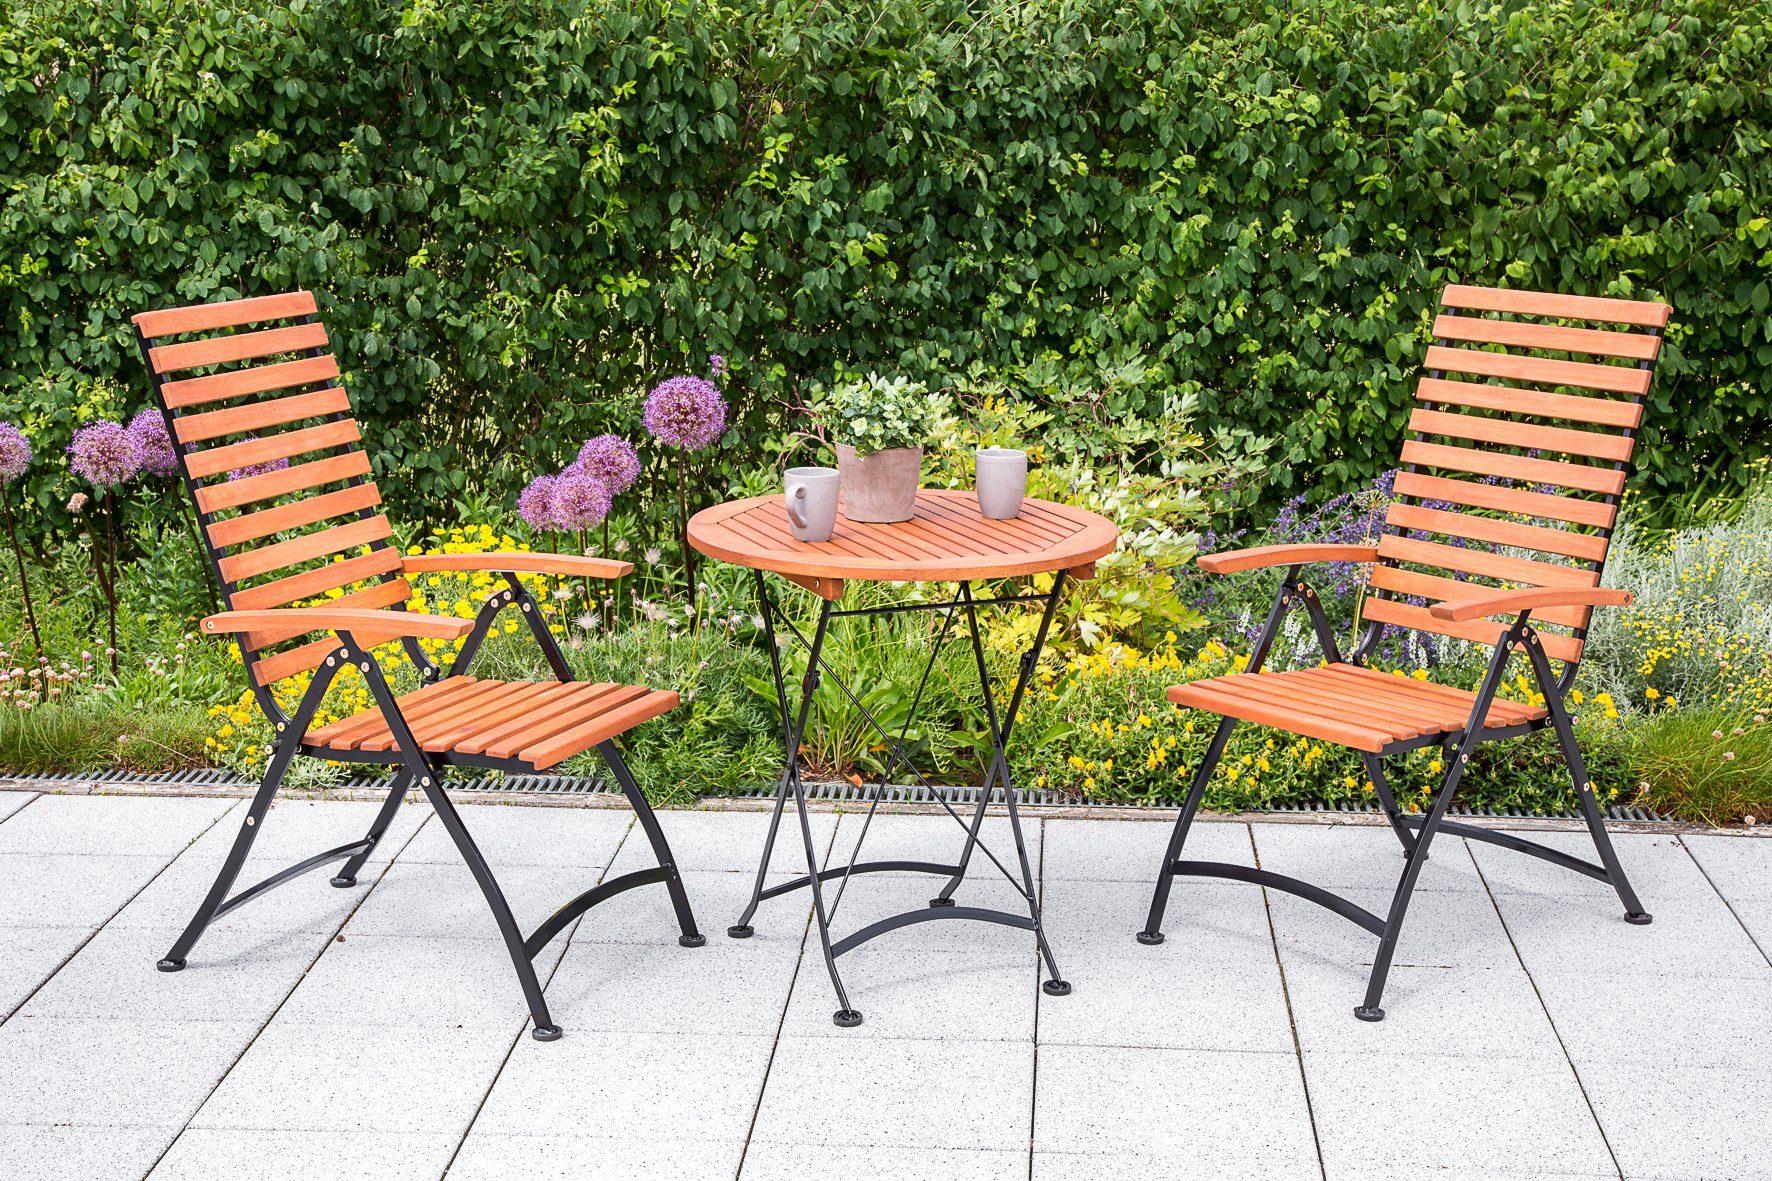 MERXX Gartenmöbelset , 3tlg., 2 Sessel, Tisch, klappbar, Eukalyptusholz